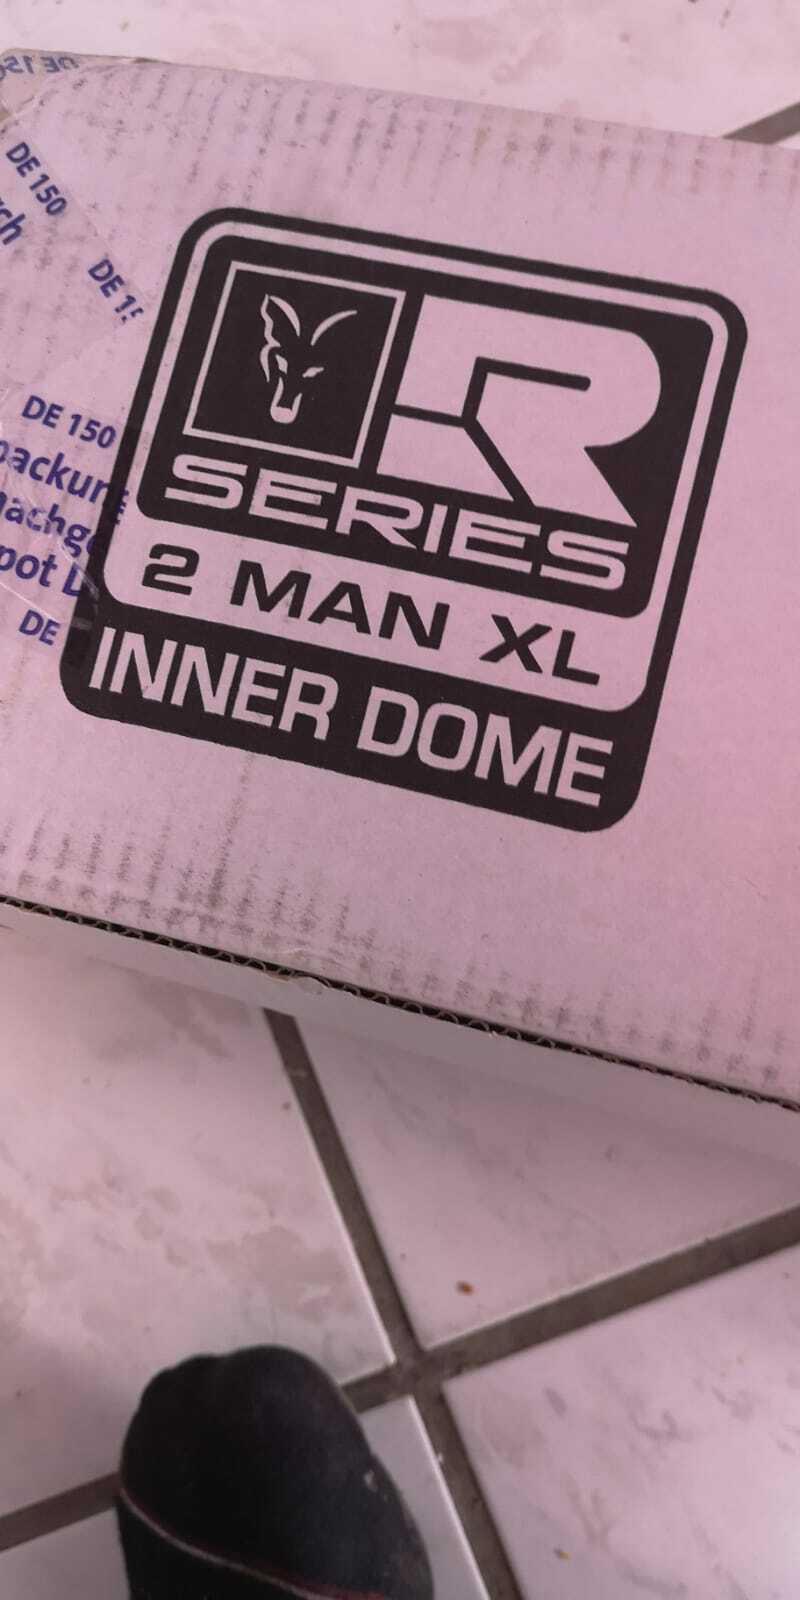 Winterskin R Series 2Man XL Inner Dome Zeltüberwurf